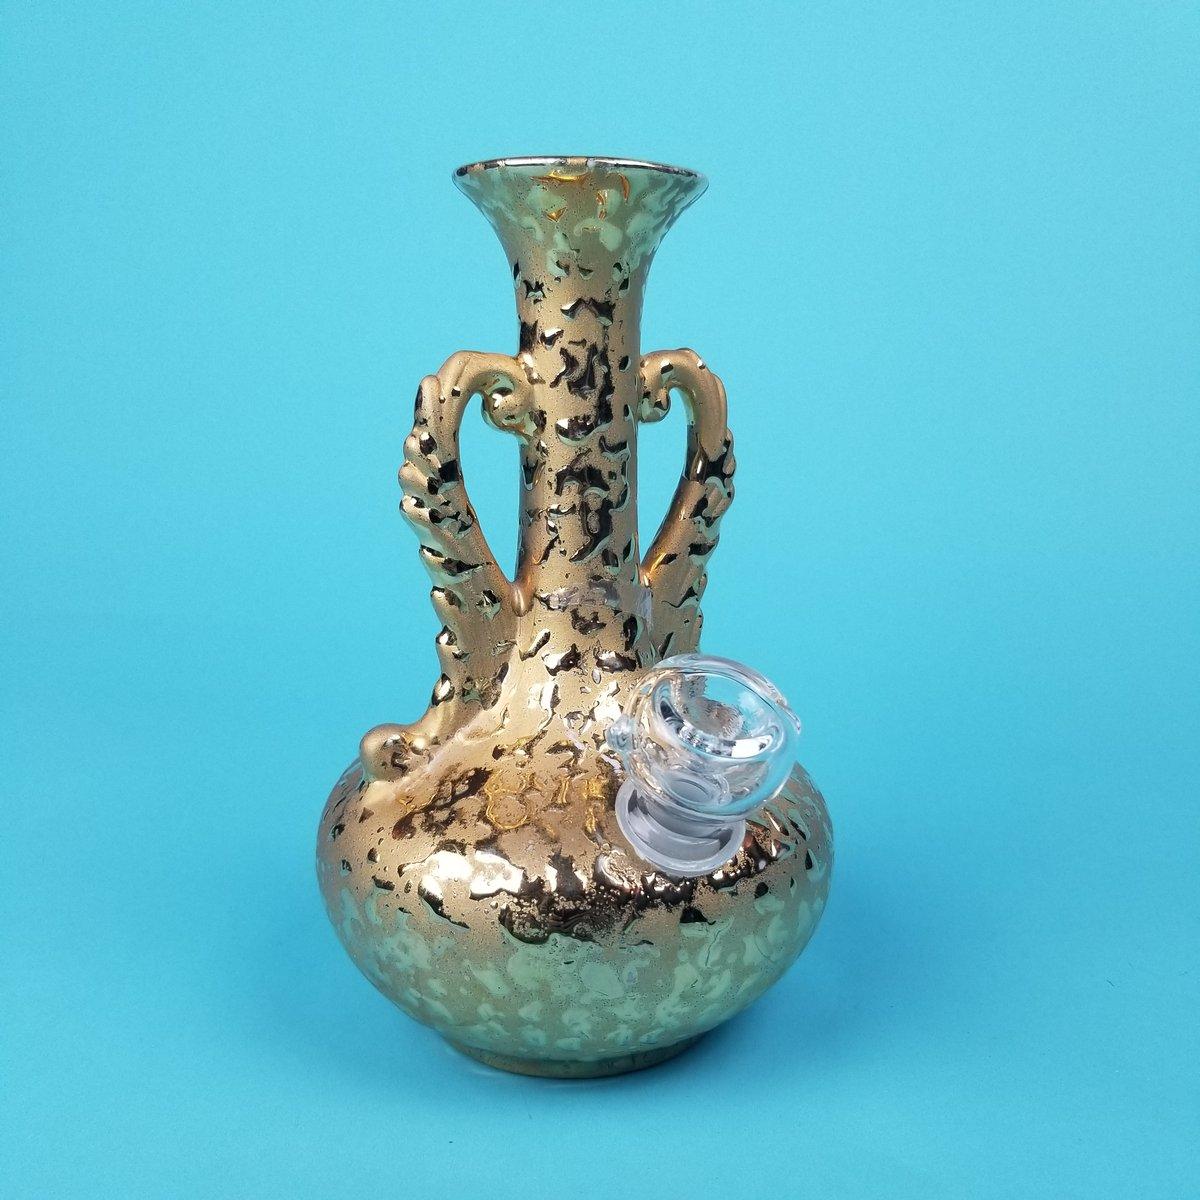 Image of 22k Weeping Gold Handle Vase